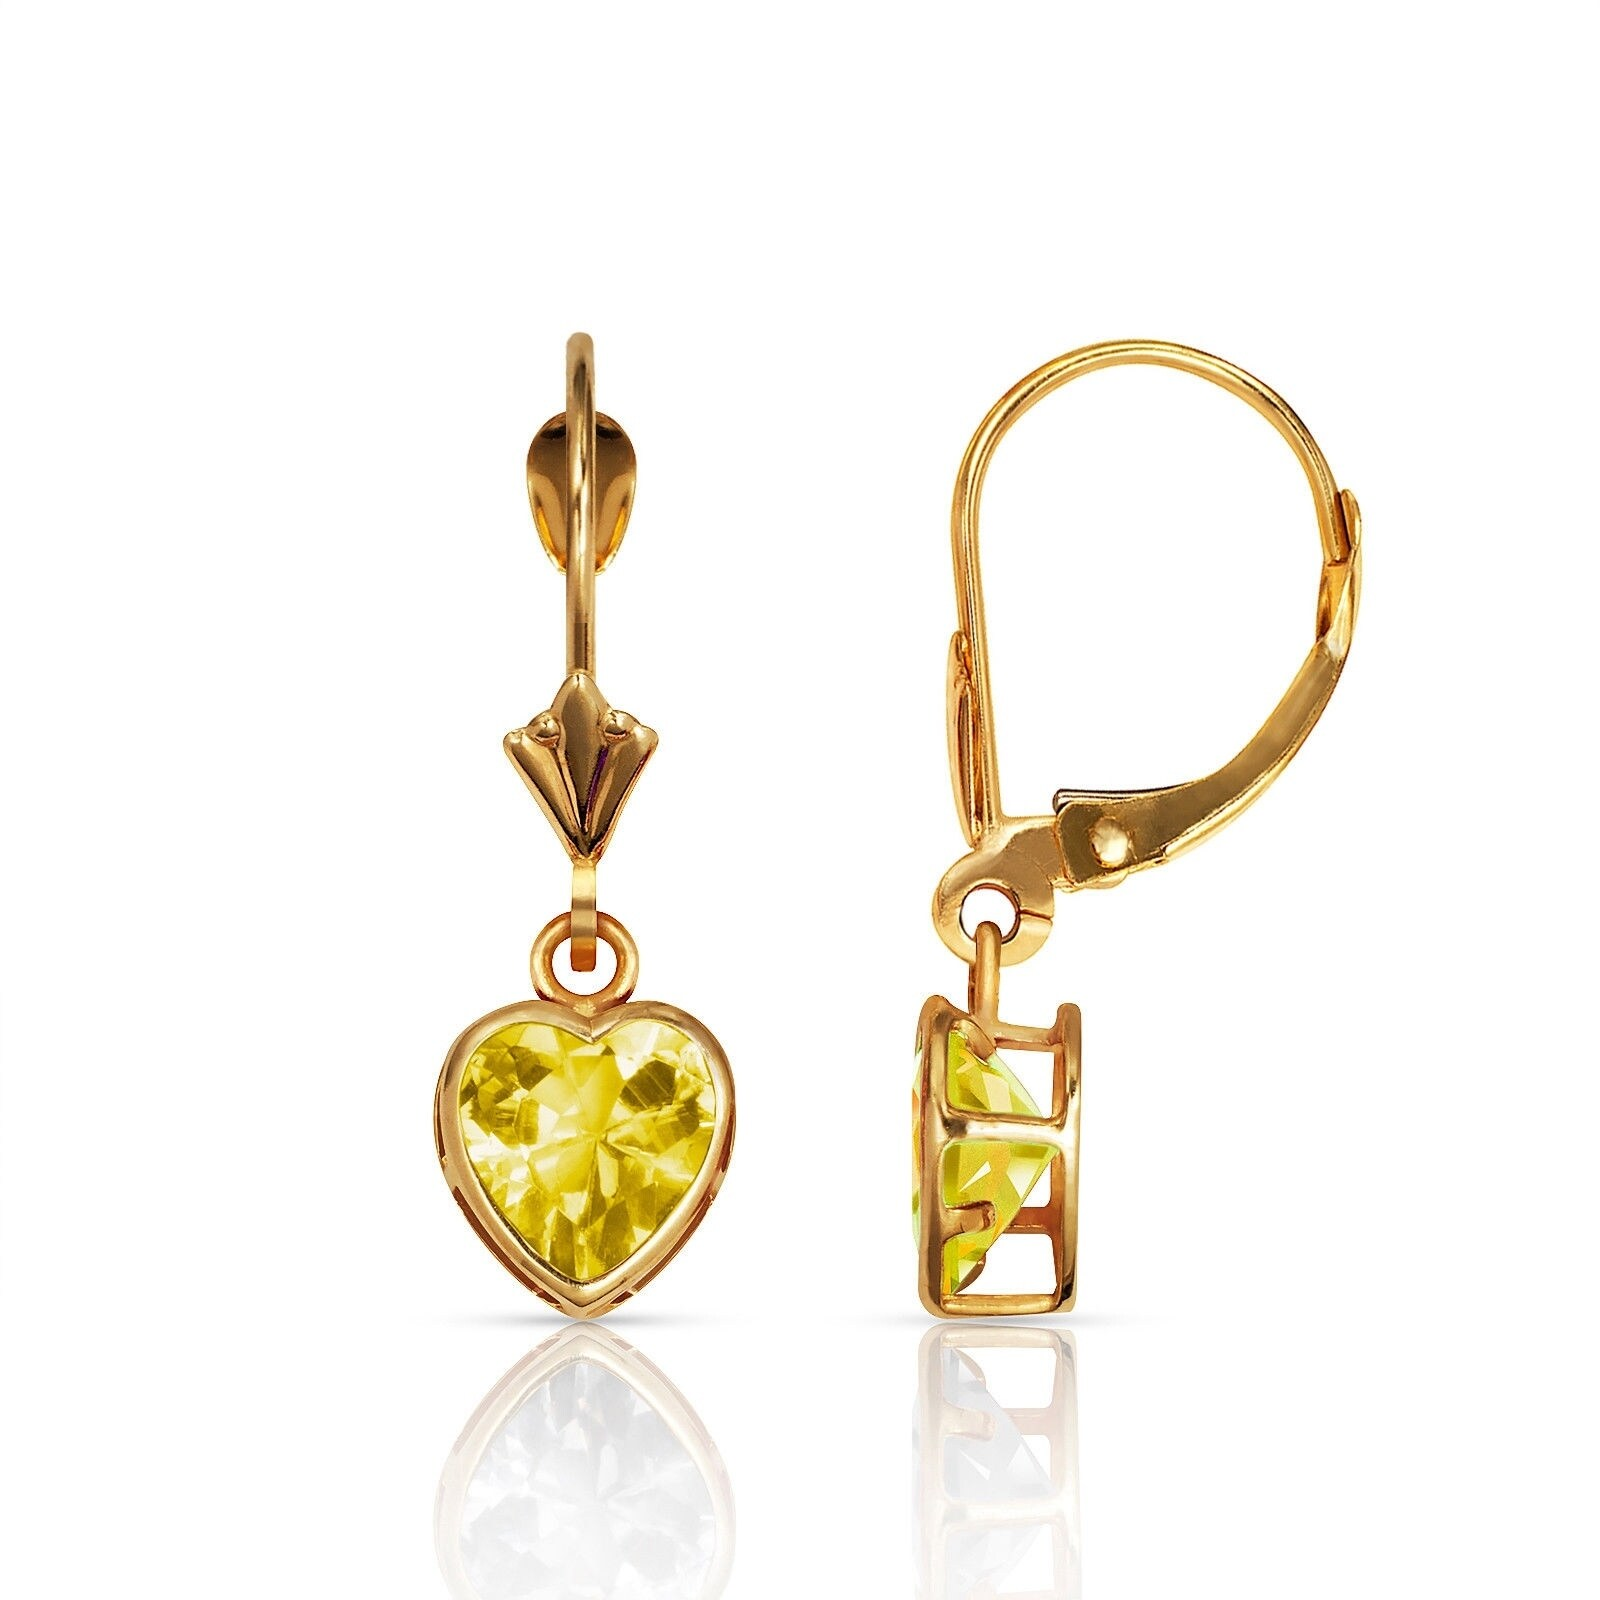 14Kt Yellow Gold Natural Aquamarine 6mm Heart Shape Bezel Stud Earrings